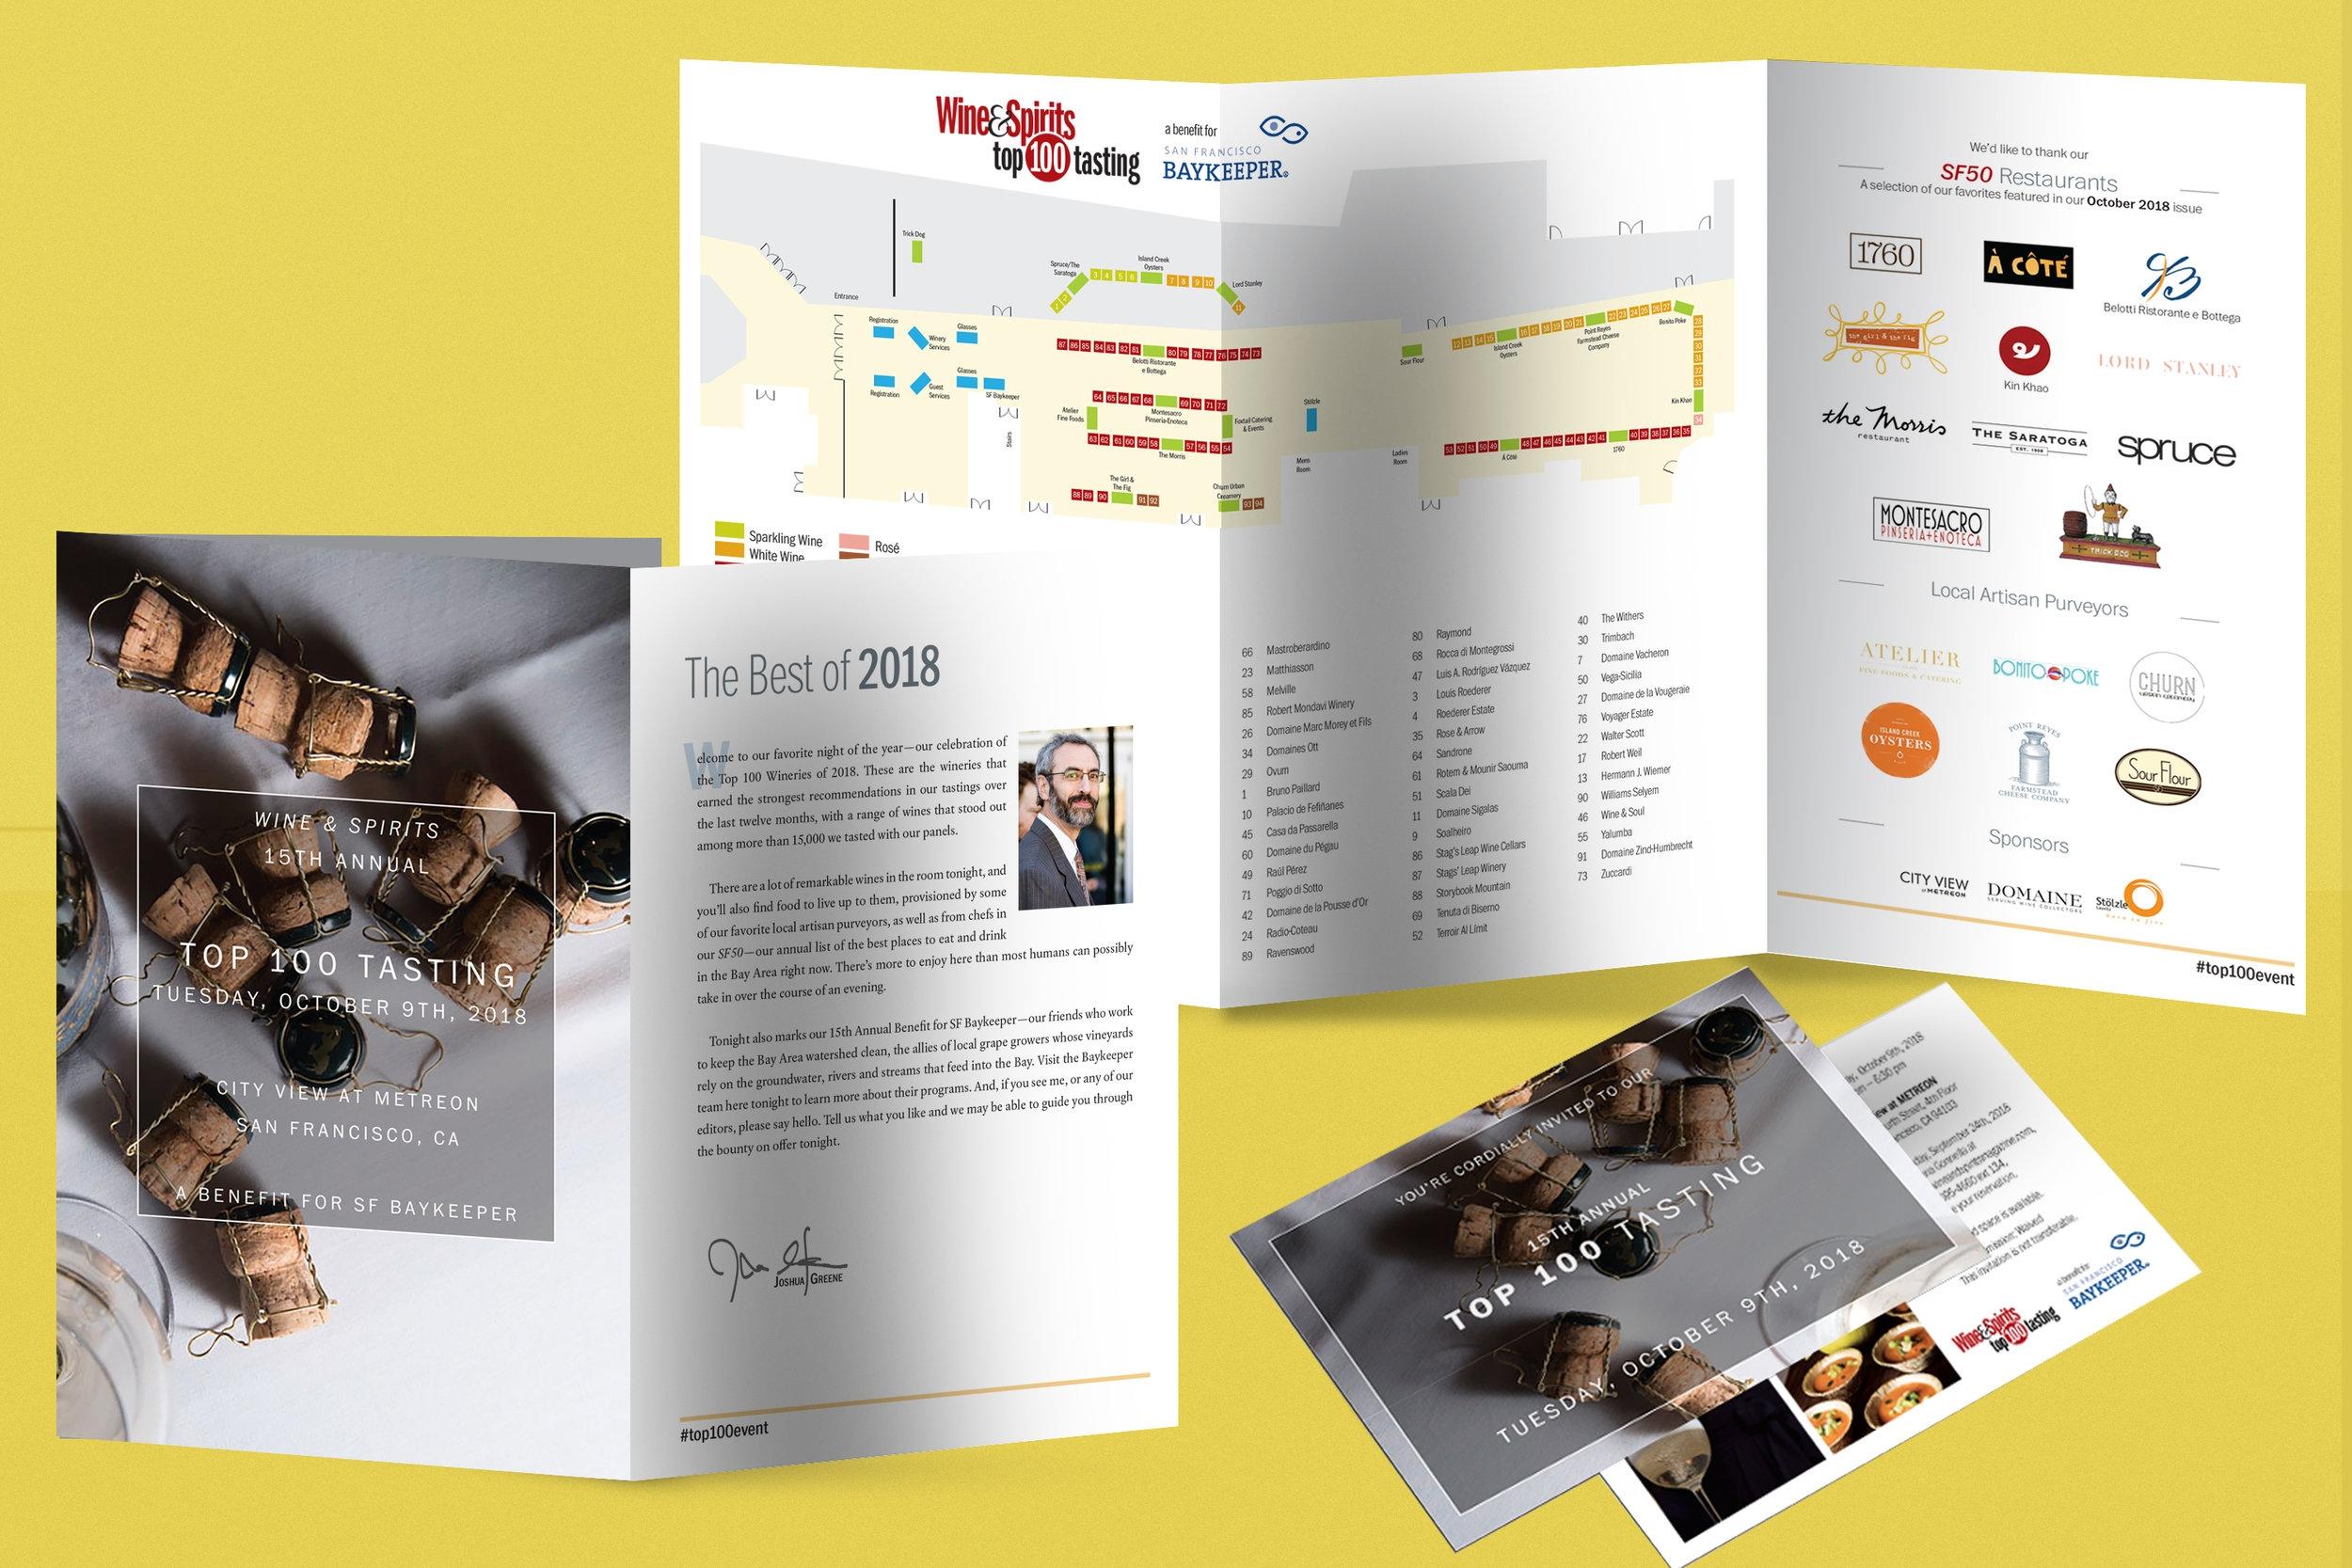 Wine & Spirits Top 100 Tasting print program and promotional postcard